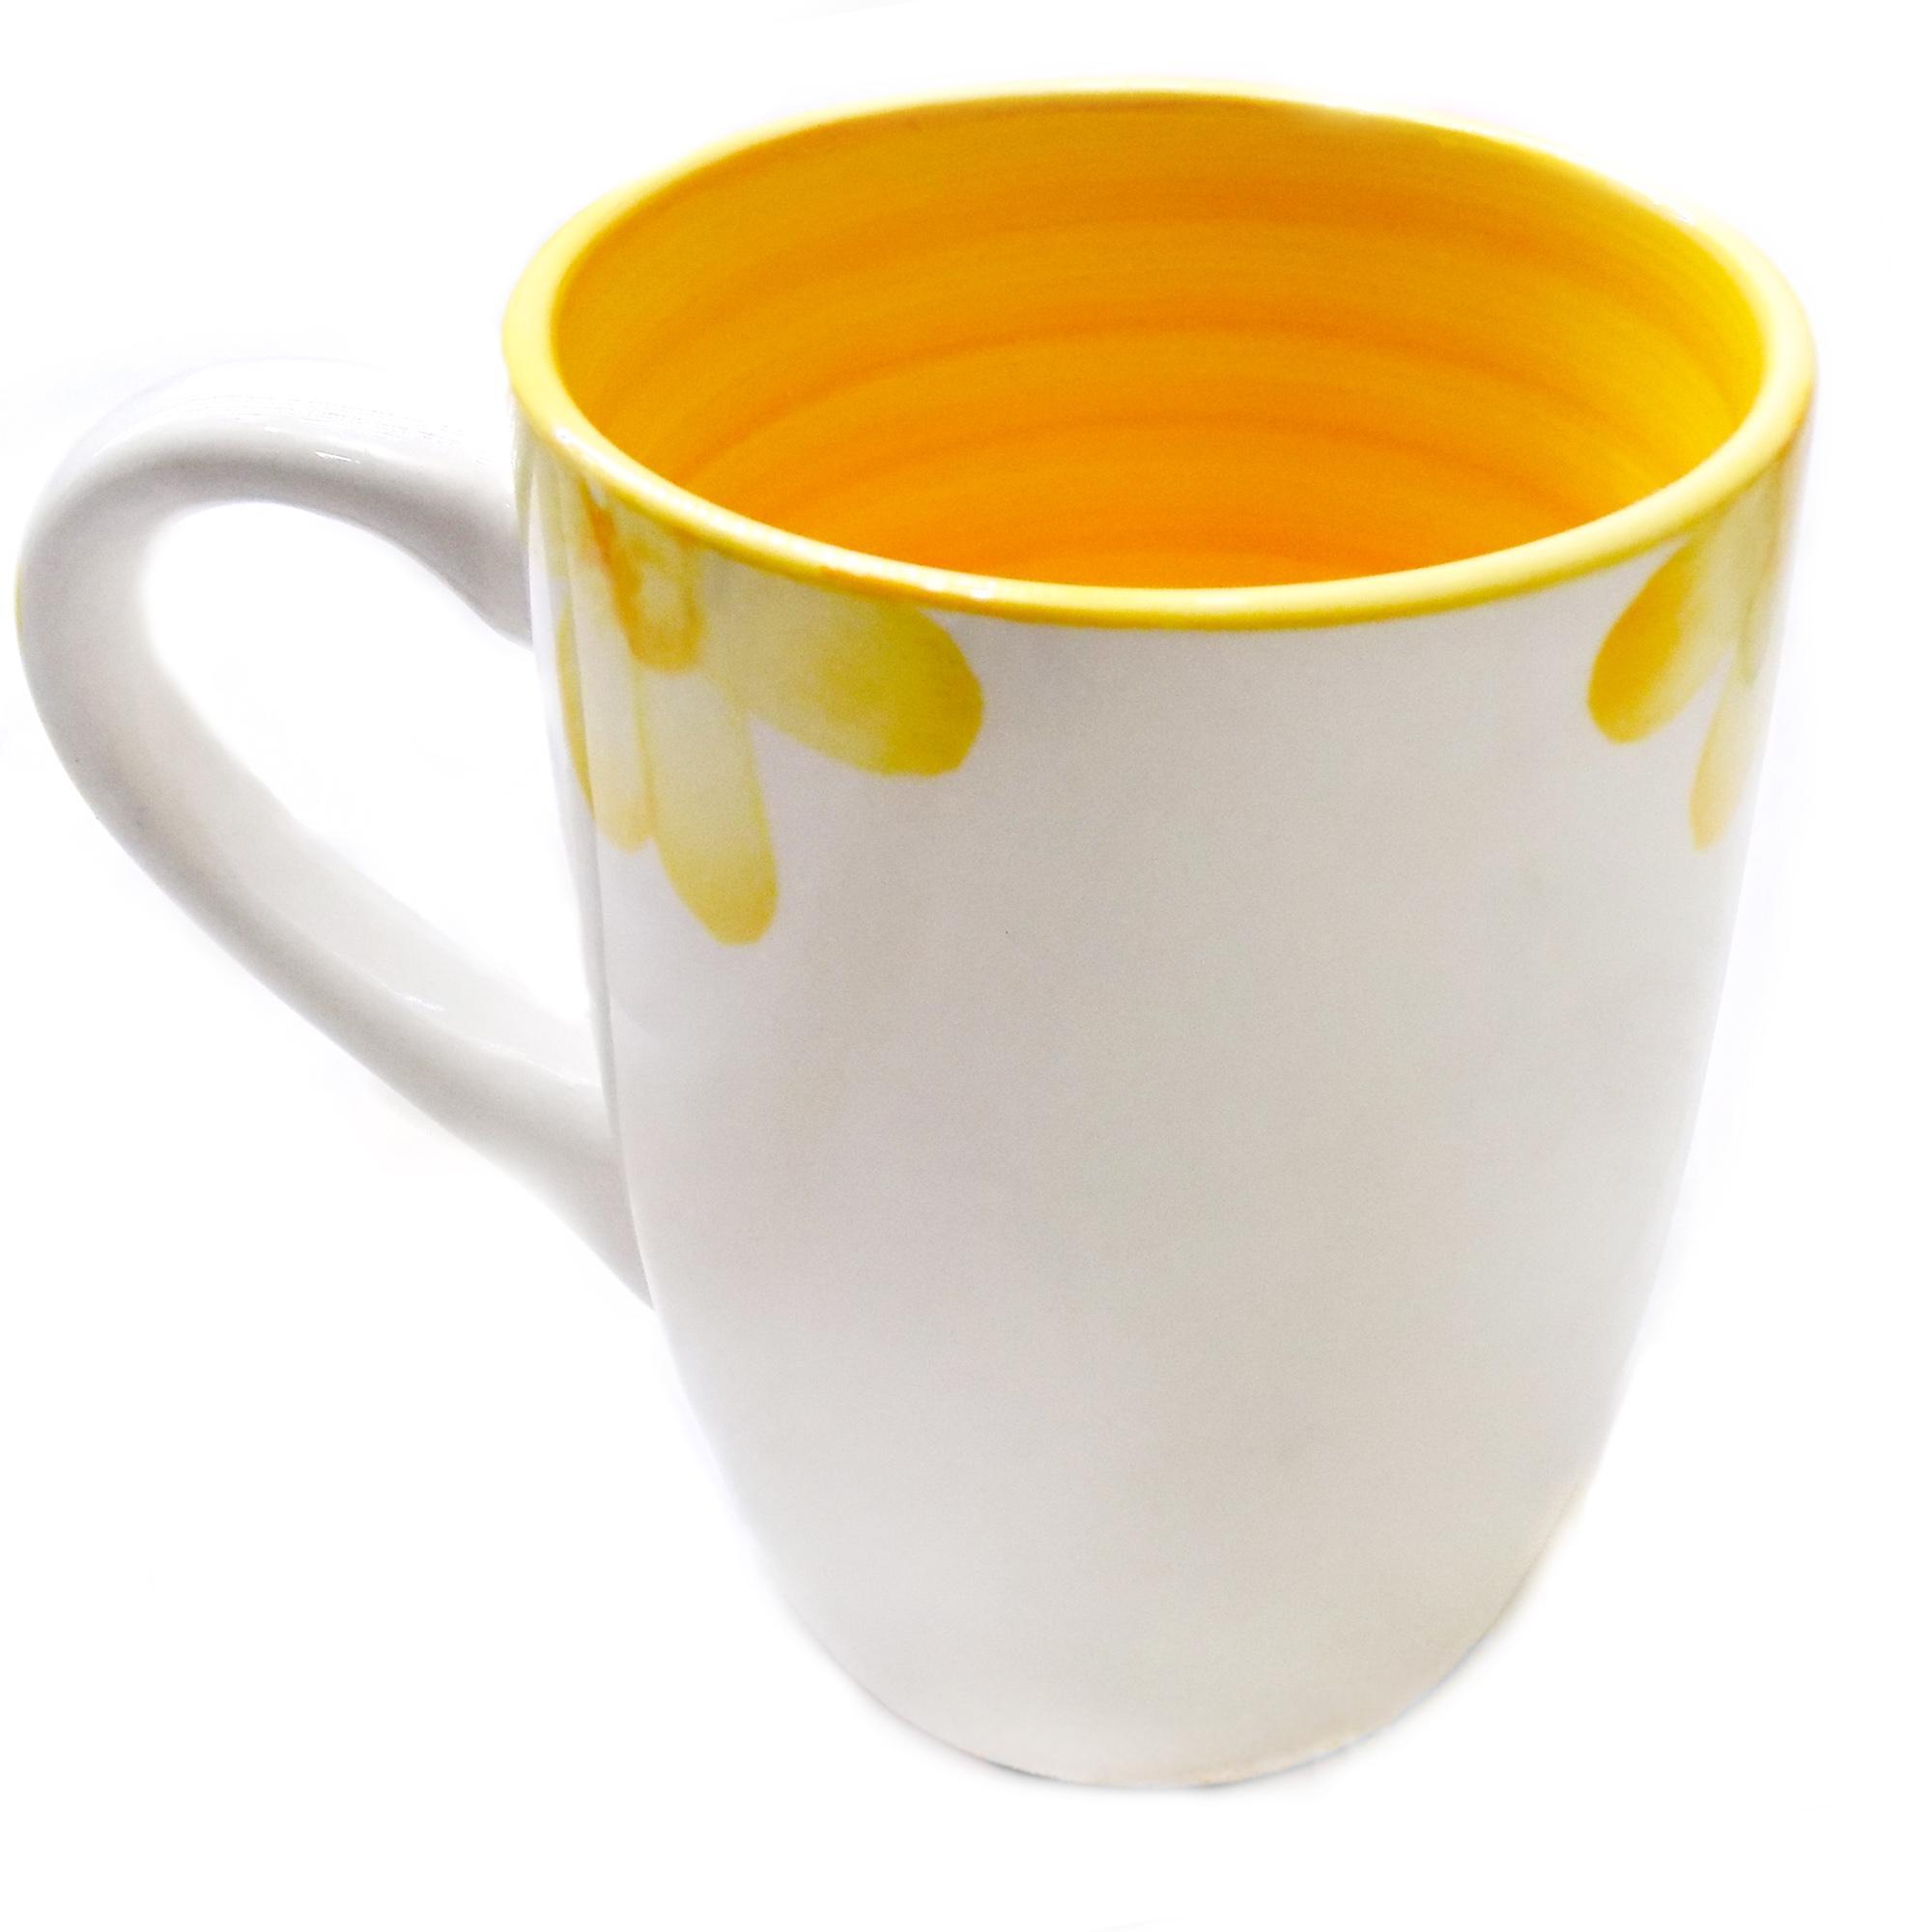 ليوان سراميكي طرح گل ka-n113 از نماي ليوان زرد